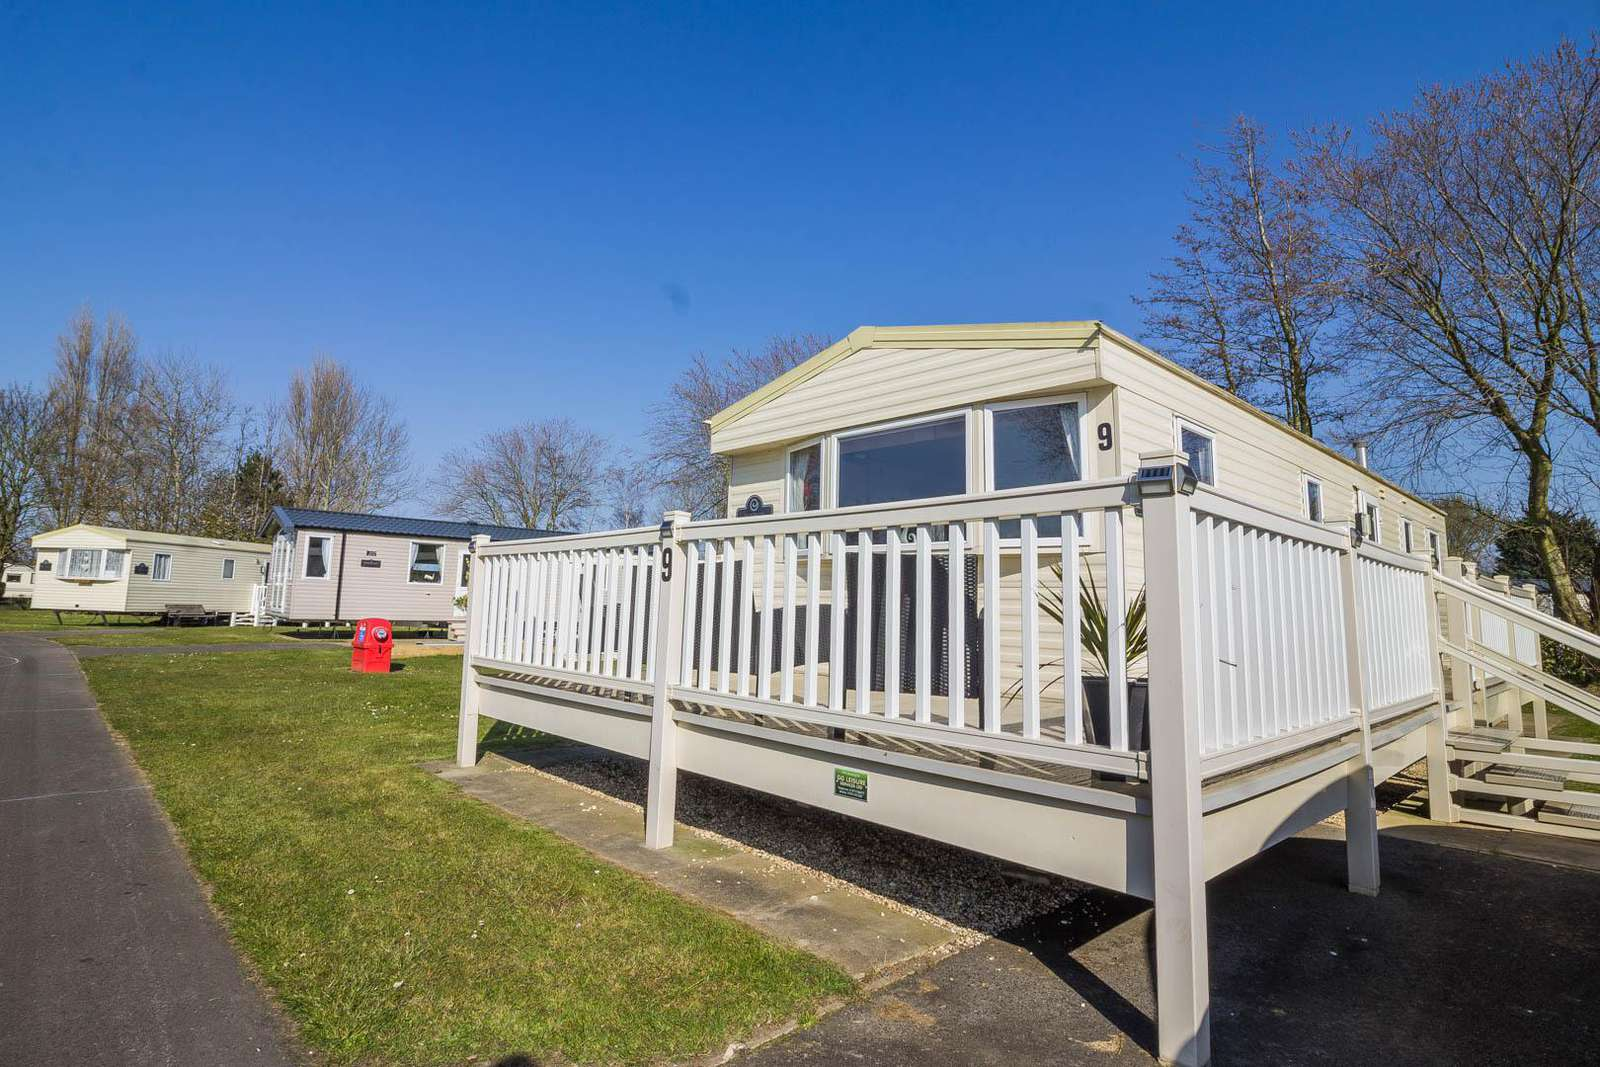 54009CB – Cedar Brook 9, 3 bed, 8 berth caravan with decking. Diamond rated. - property